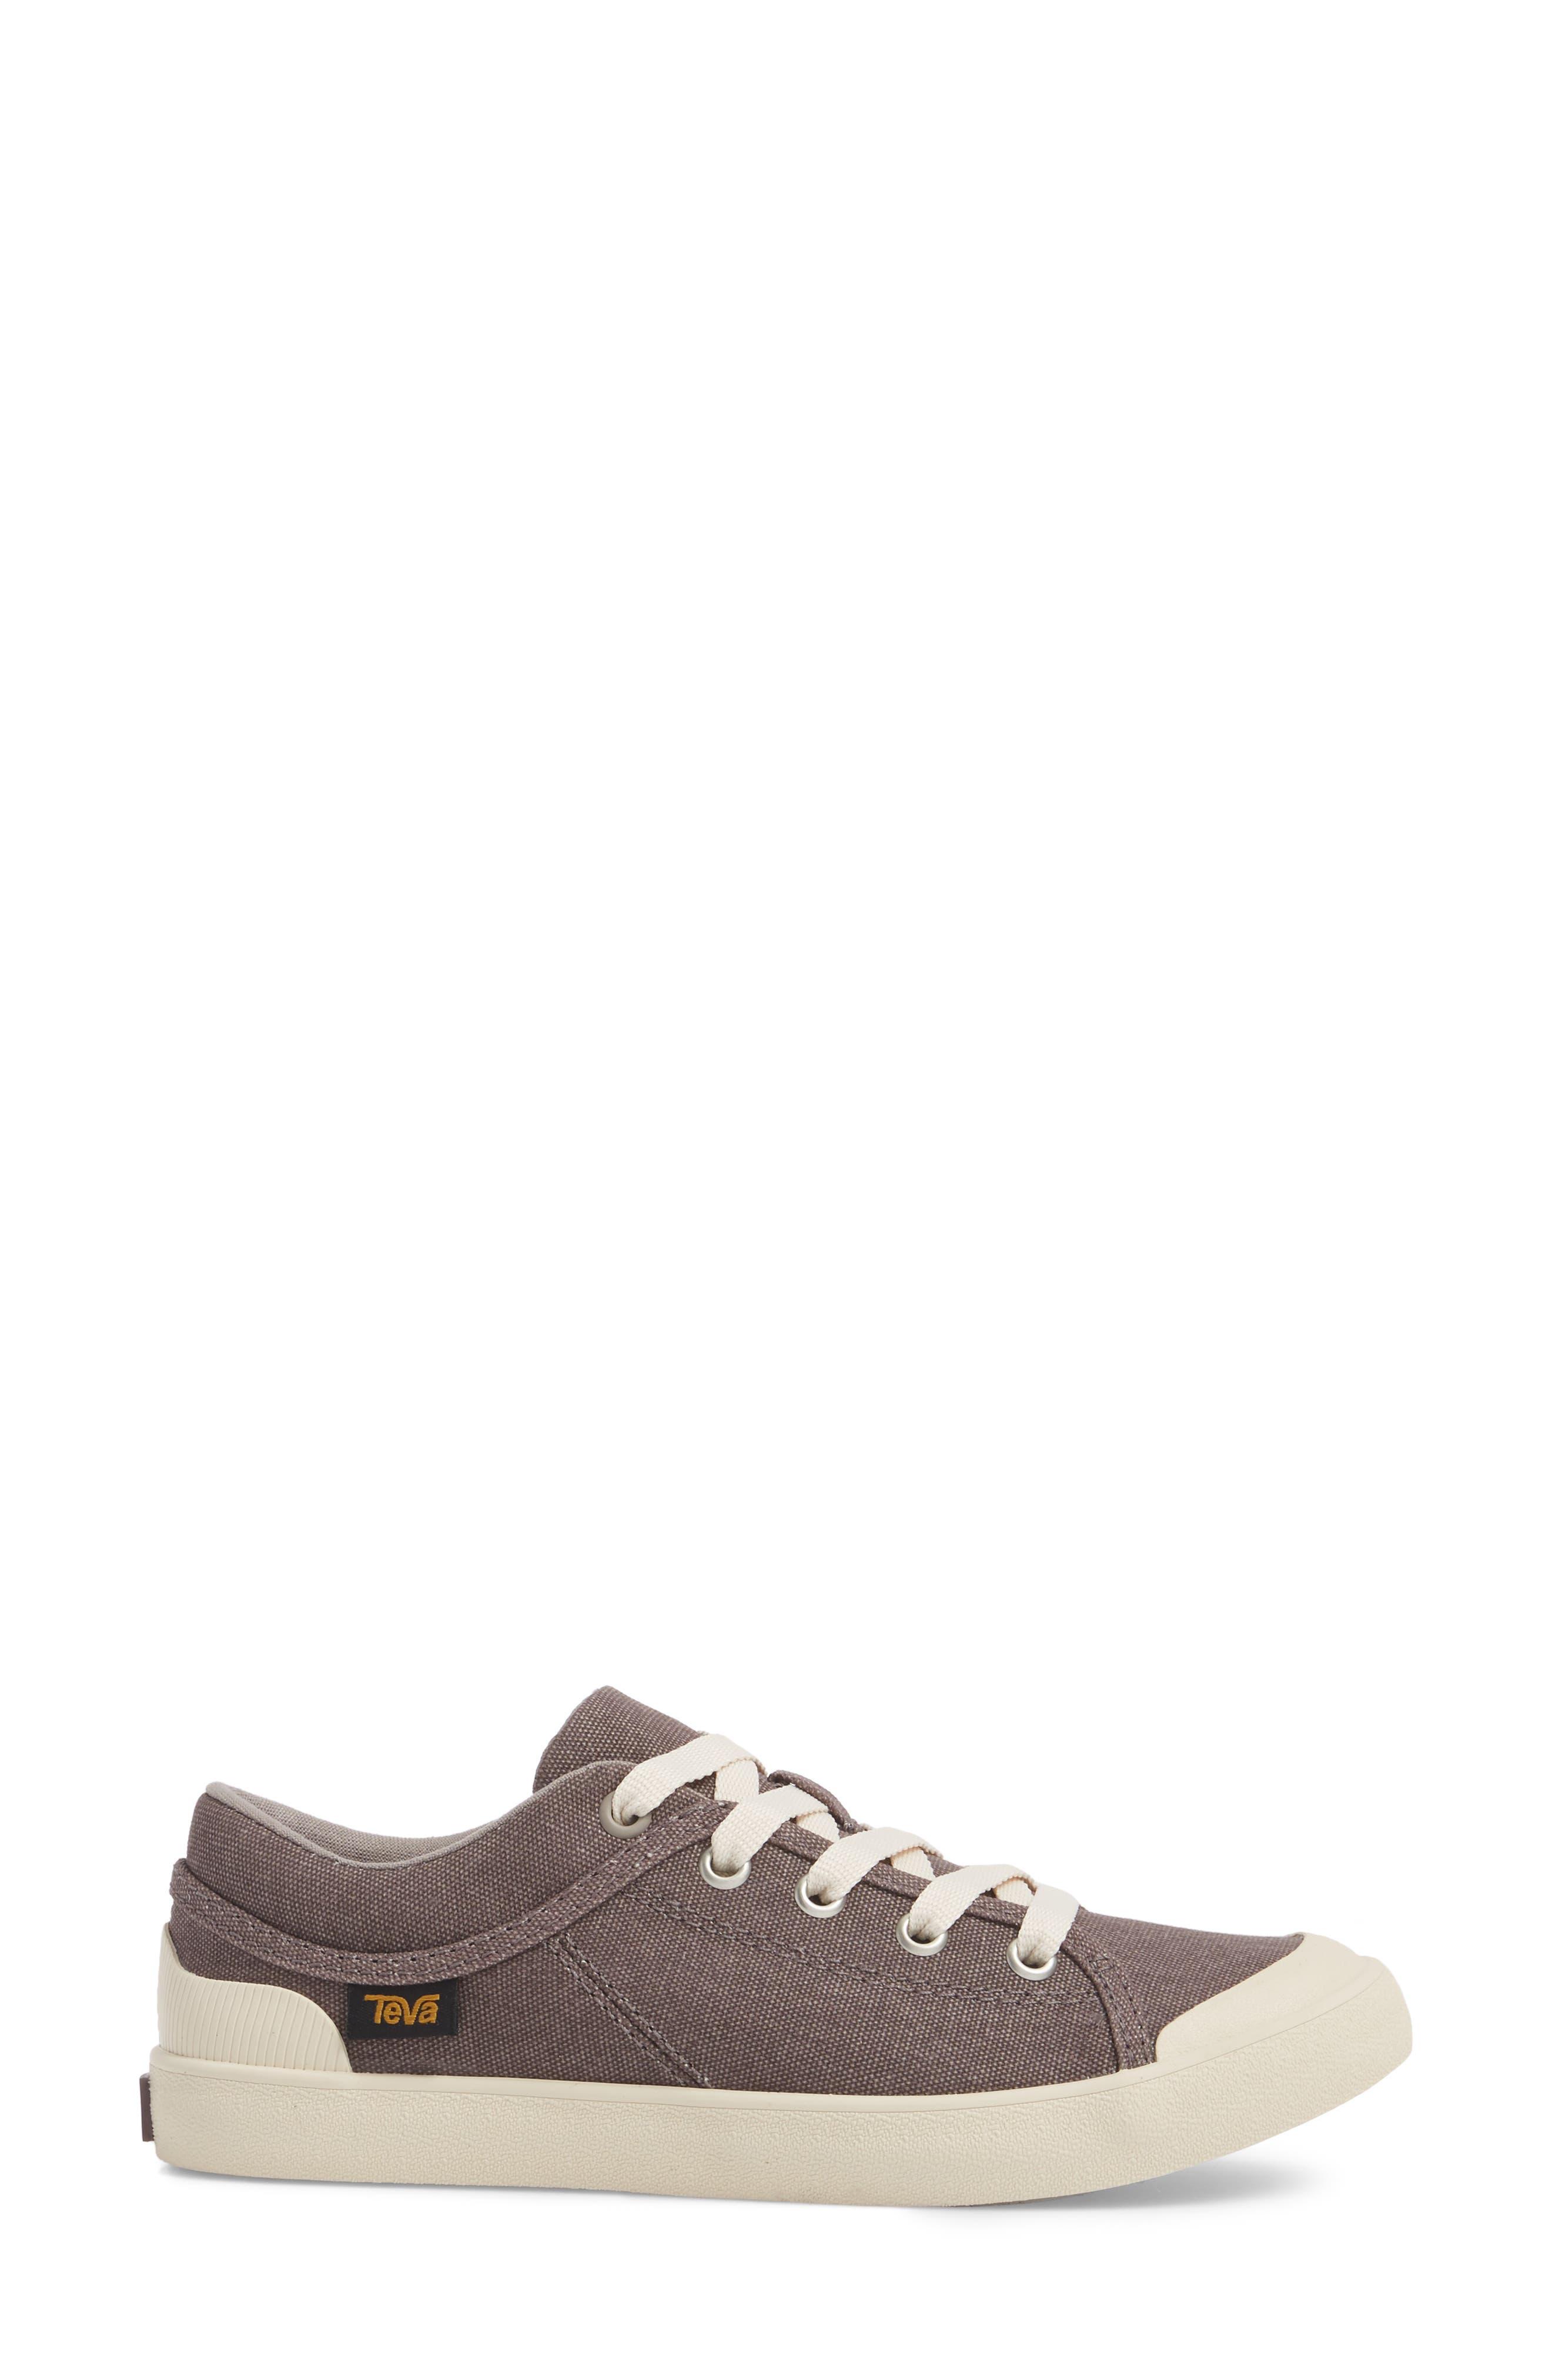 'Freewheel' Sneaker,                             Alternate thumbnail 3, color,                             Plum Truffle